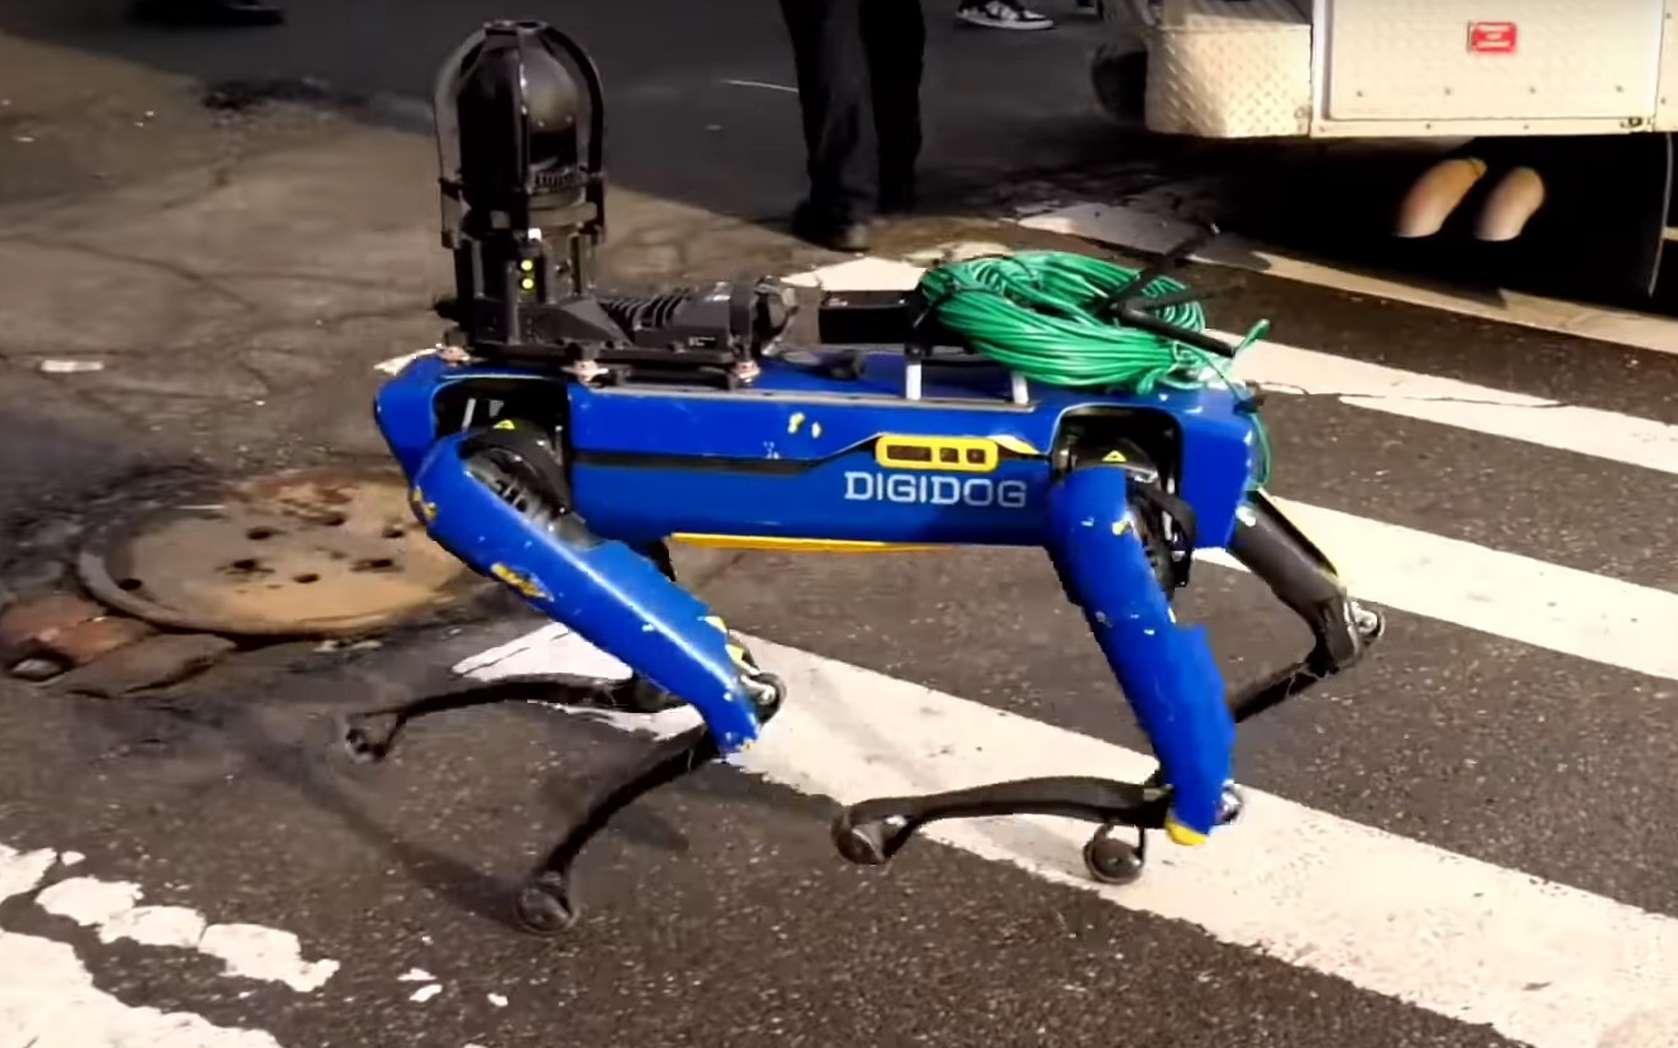 Spot, alias Digidog, en intervention à New York. © FreedomNewsTV